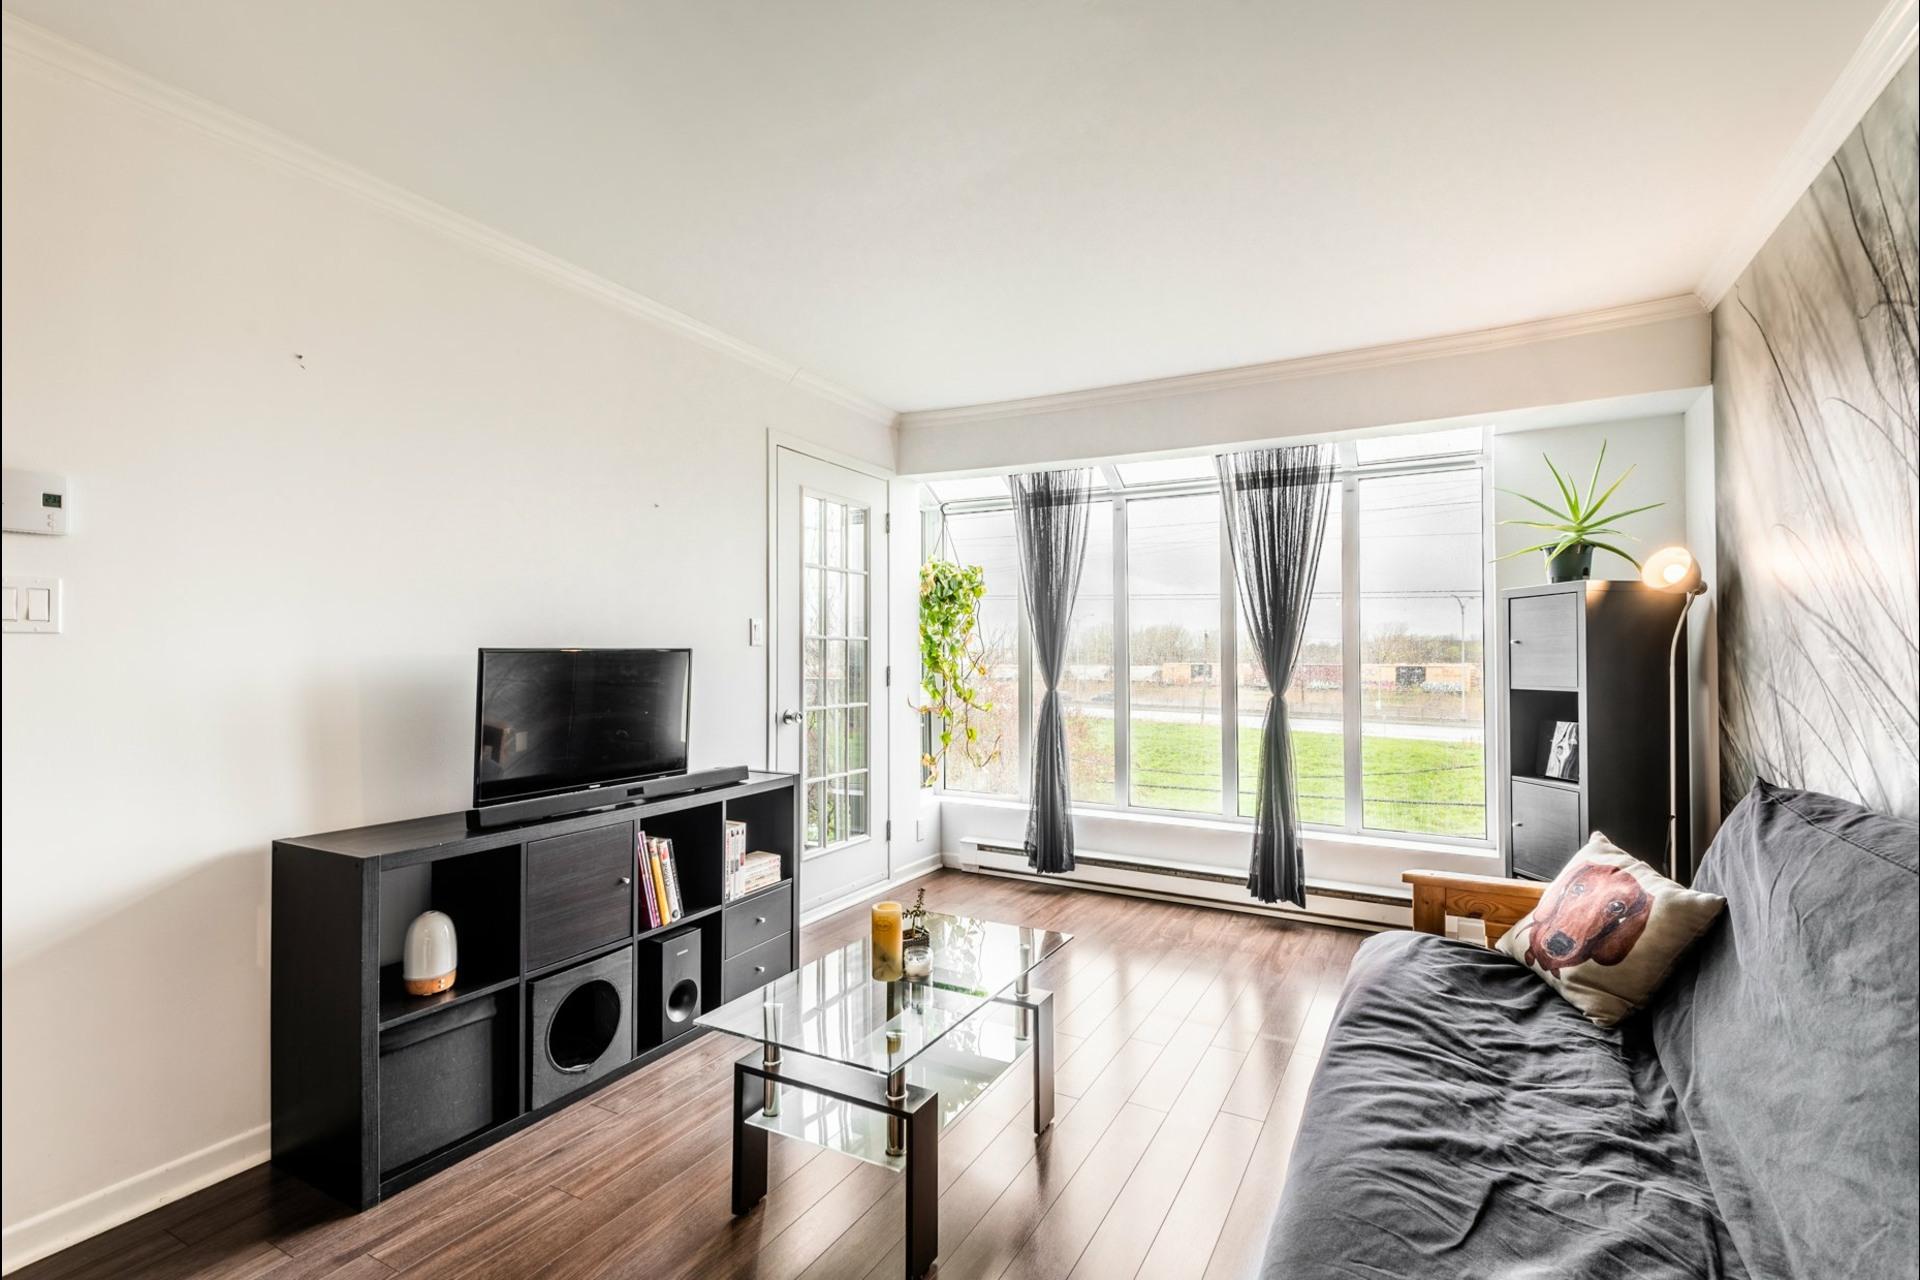 image 10 - Apartment For sale Saint-Hubert Longueuil  - 4 rooms